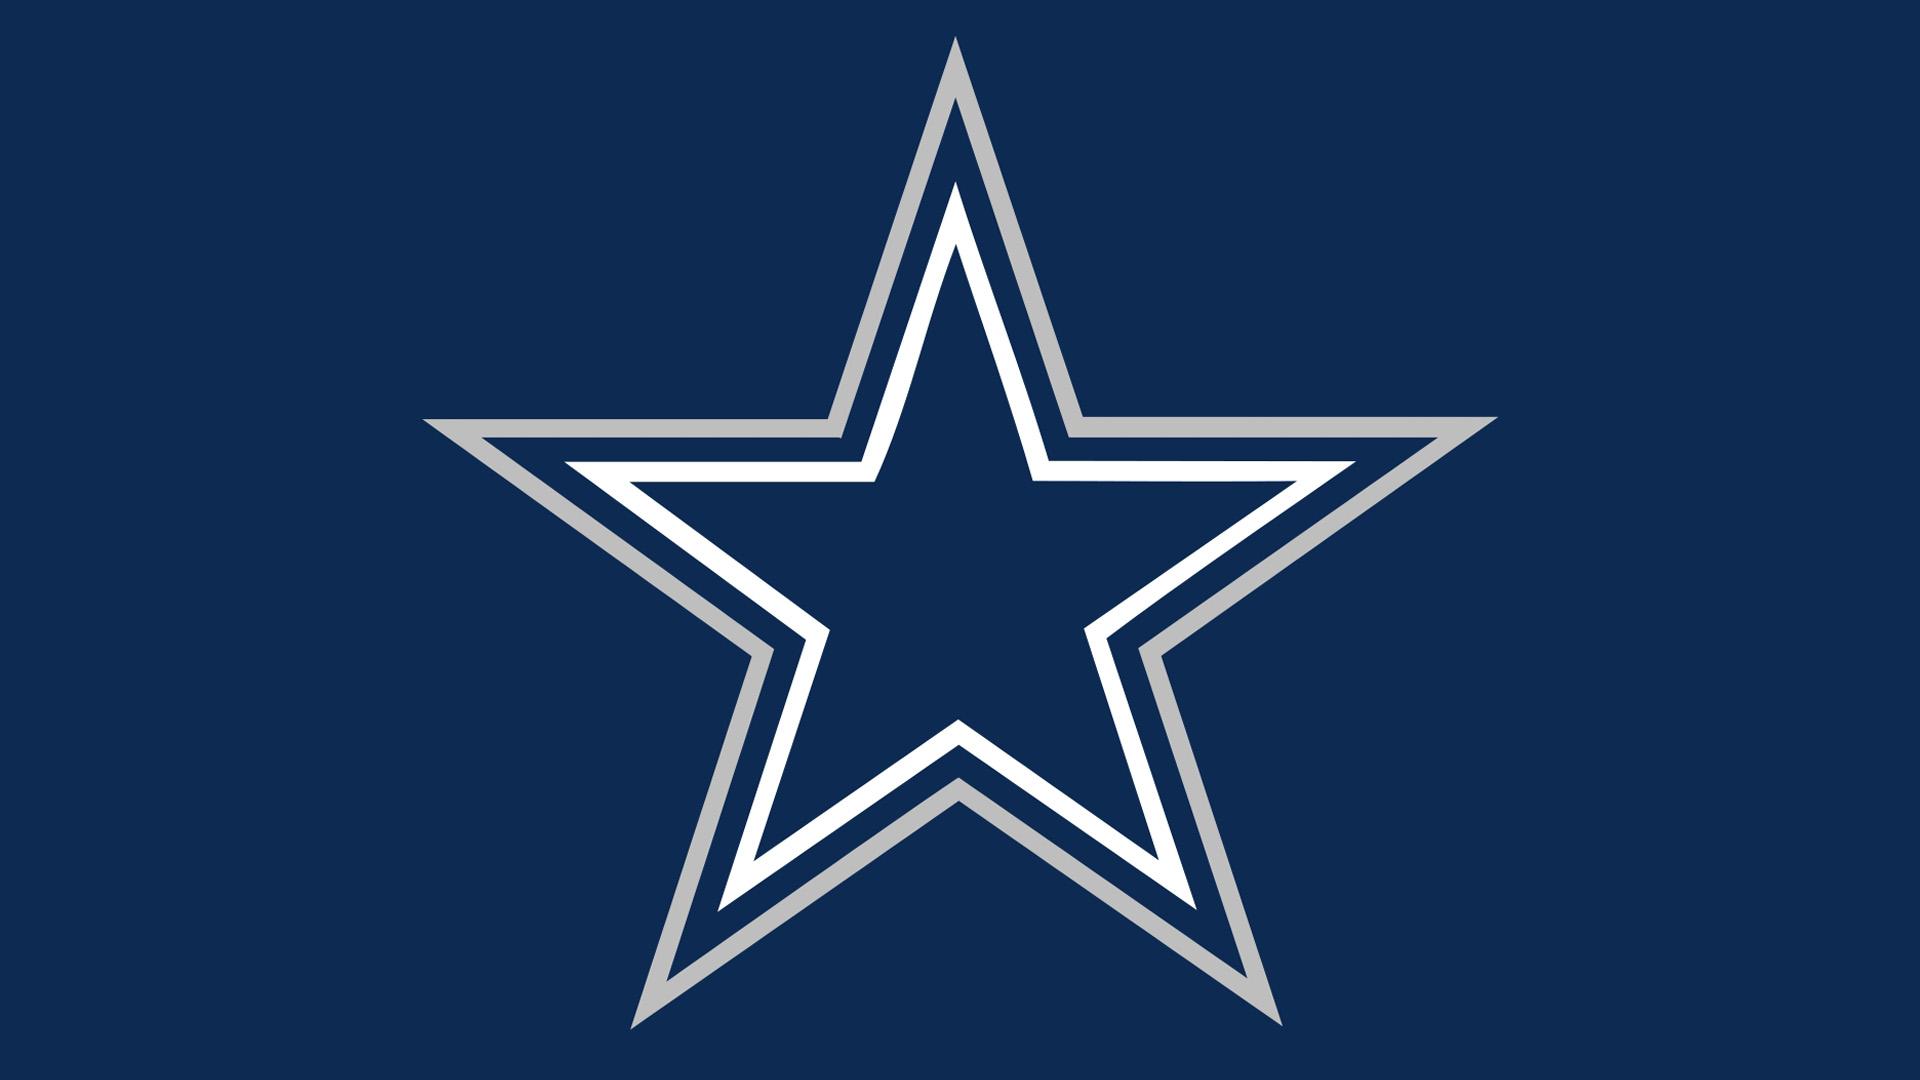 Dallas Cowboys Stars Logo Clipart Best